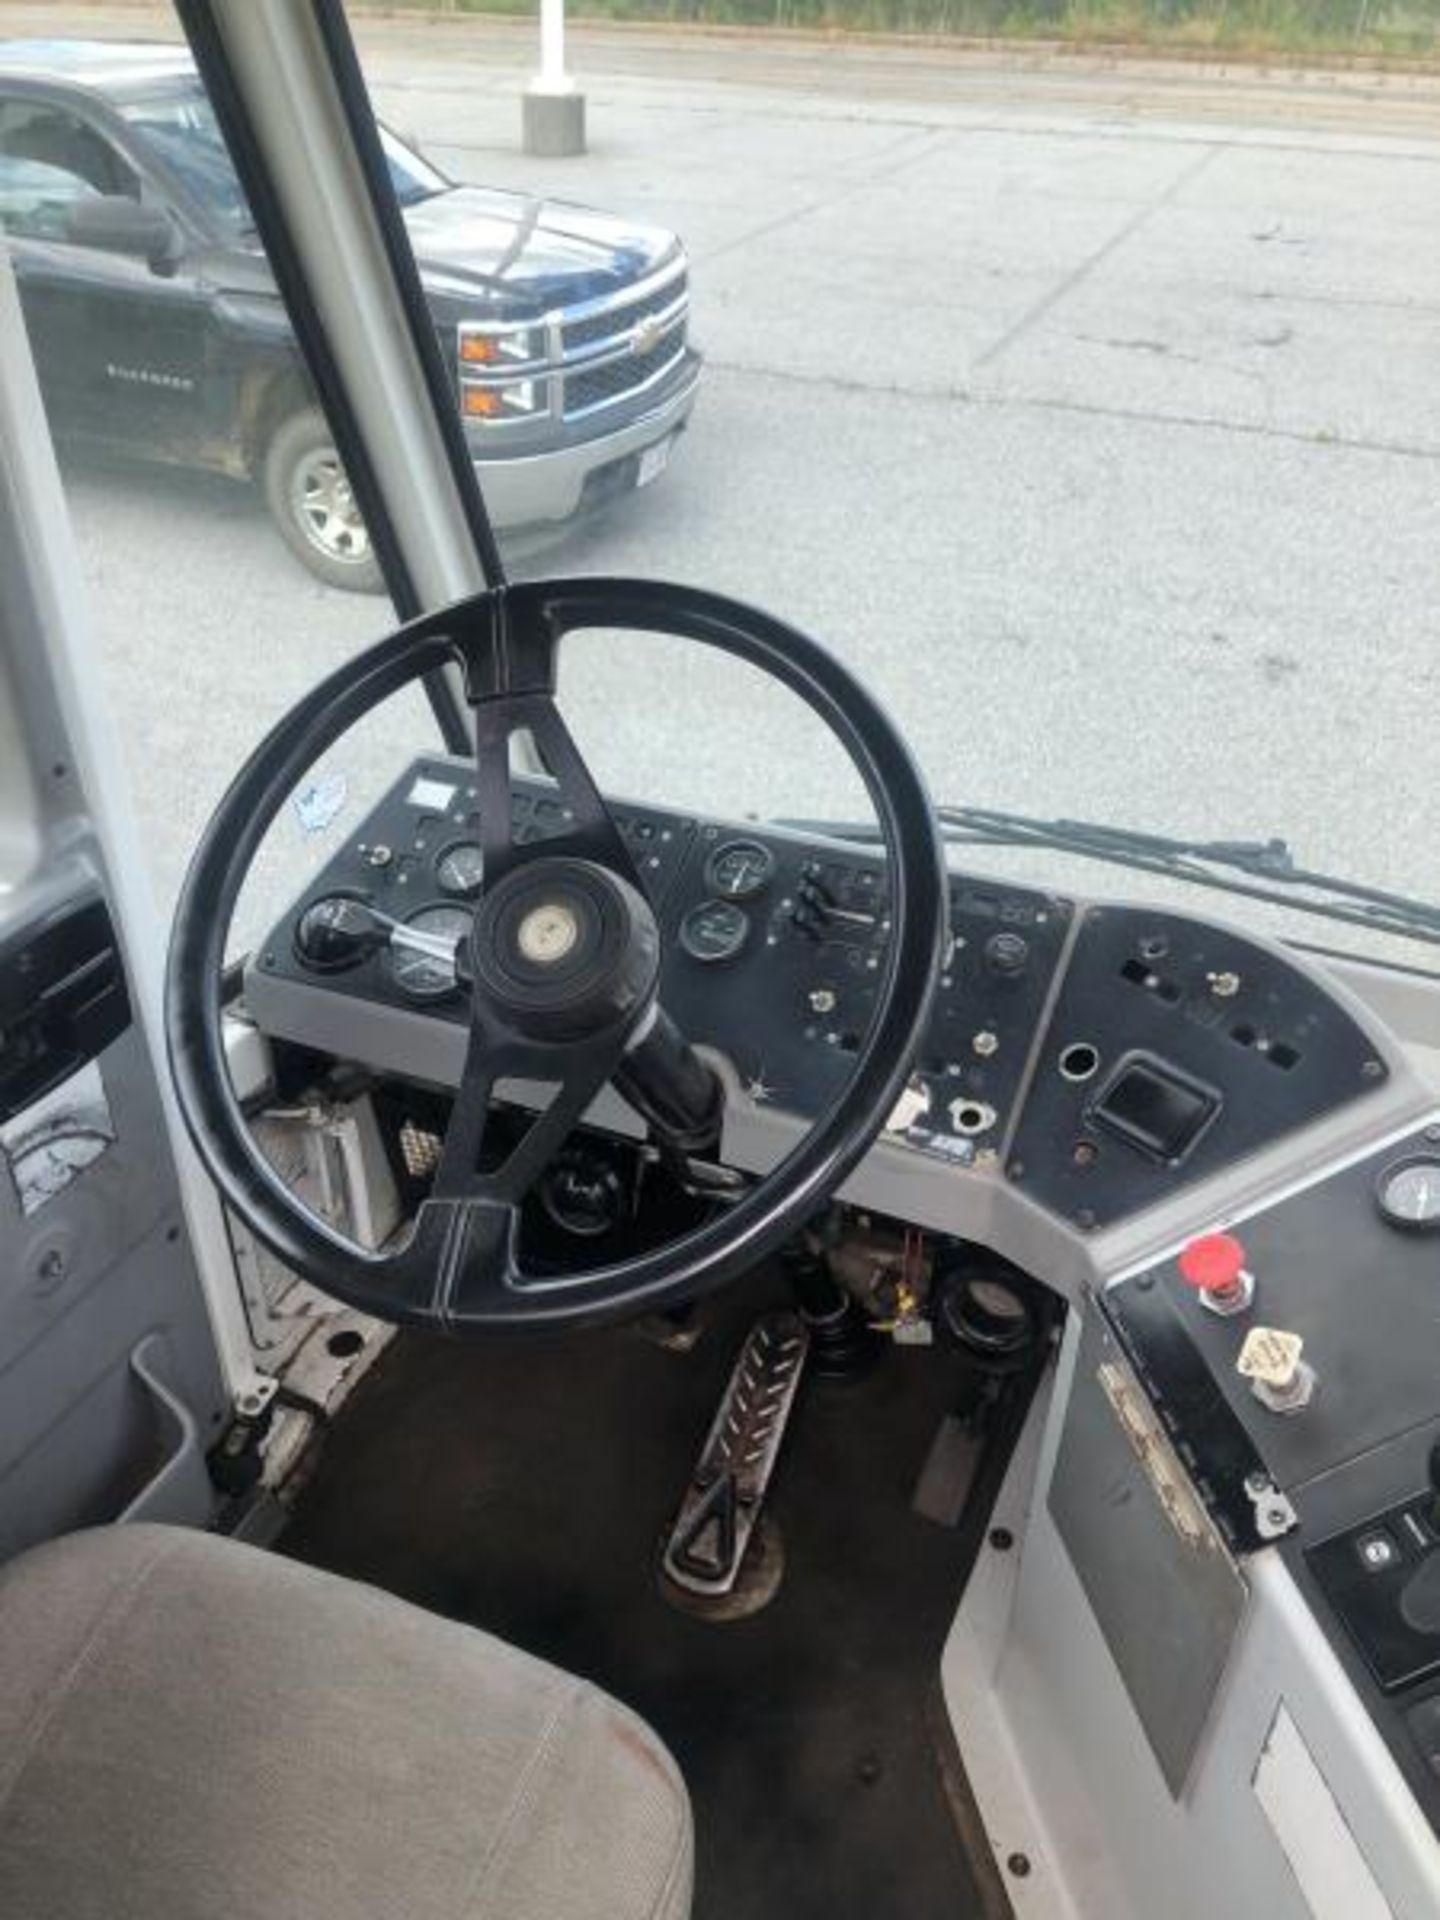 2015 Kalmar Ottawa 4x2 Yard Truck , SN: 338845 2,600.5 Hours, 185 Miles - Image 22 of 27